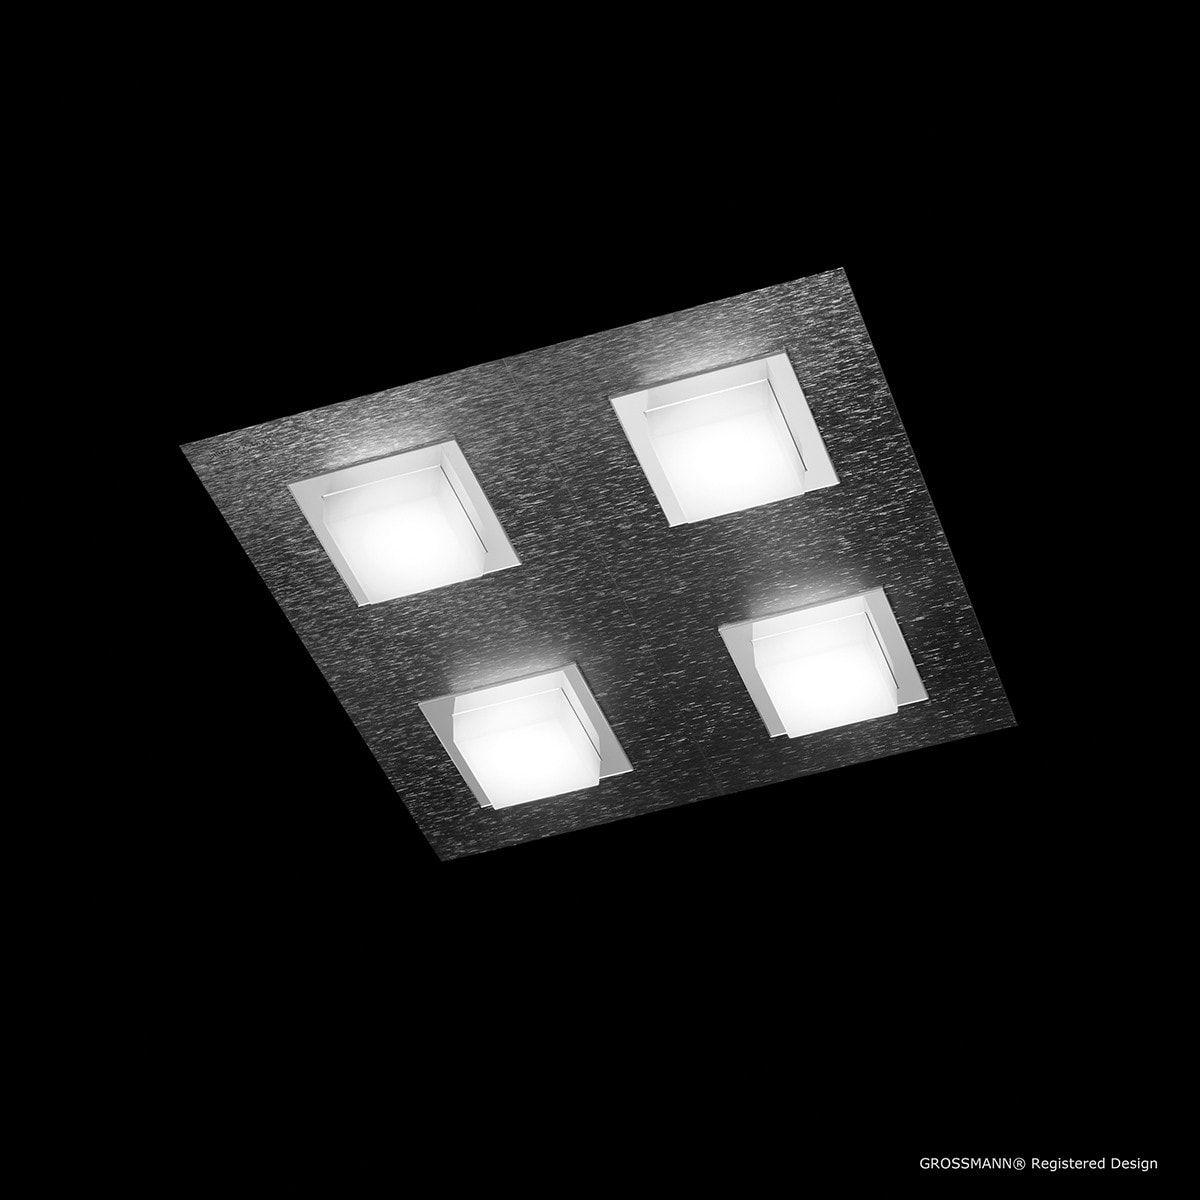 Badezimmer Beleuchtung Led Rgb Deckenleuchte Bad Ip Led Deckenfluter Dimmbar Ohne Leseleuchte Indirekte Beleuchtung Led Deckenleuchte Badbeleuchtung Led